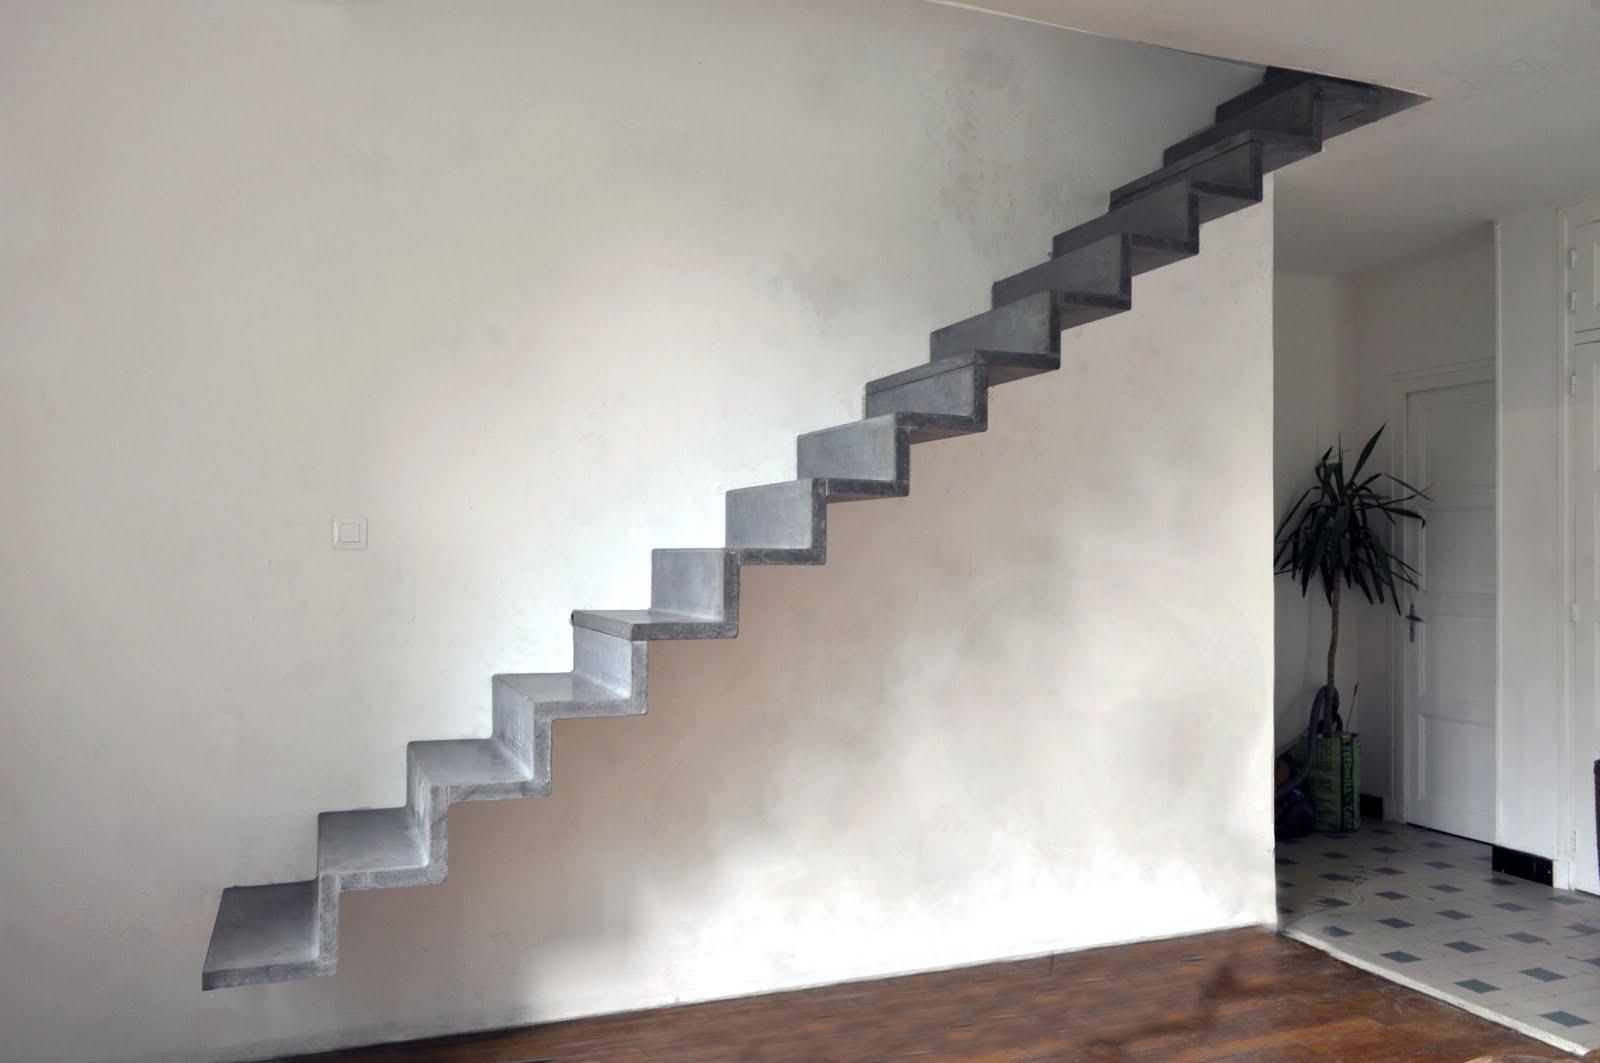 escalier milieu de piece. Black Bedroom Furniture Sets. Home Design Ideas